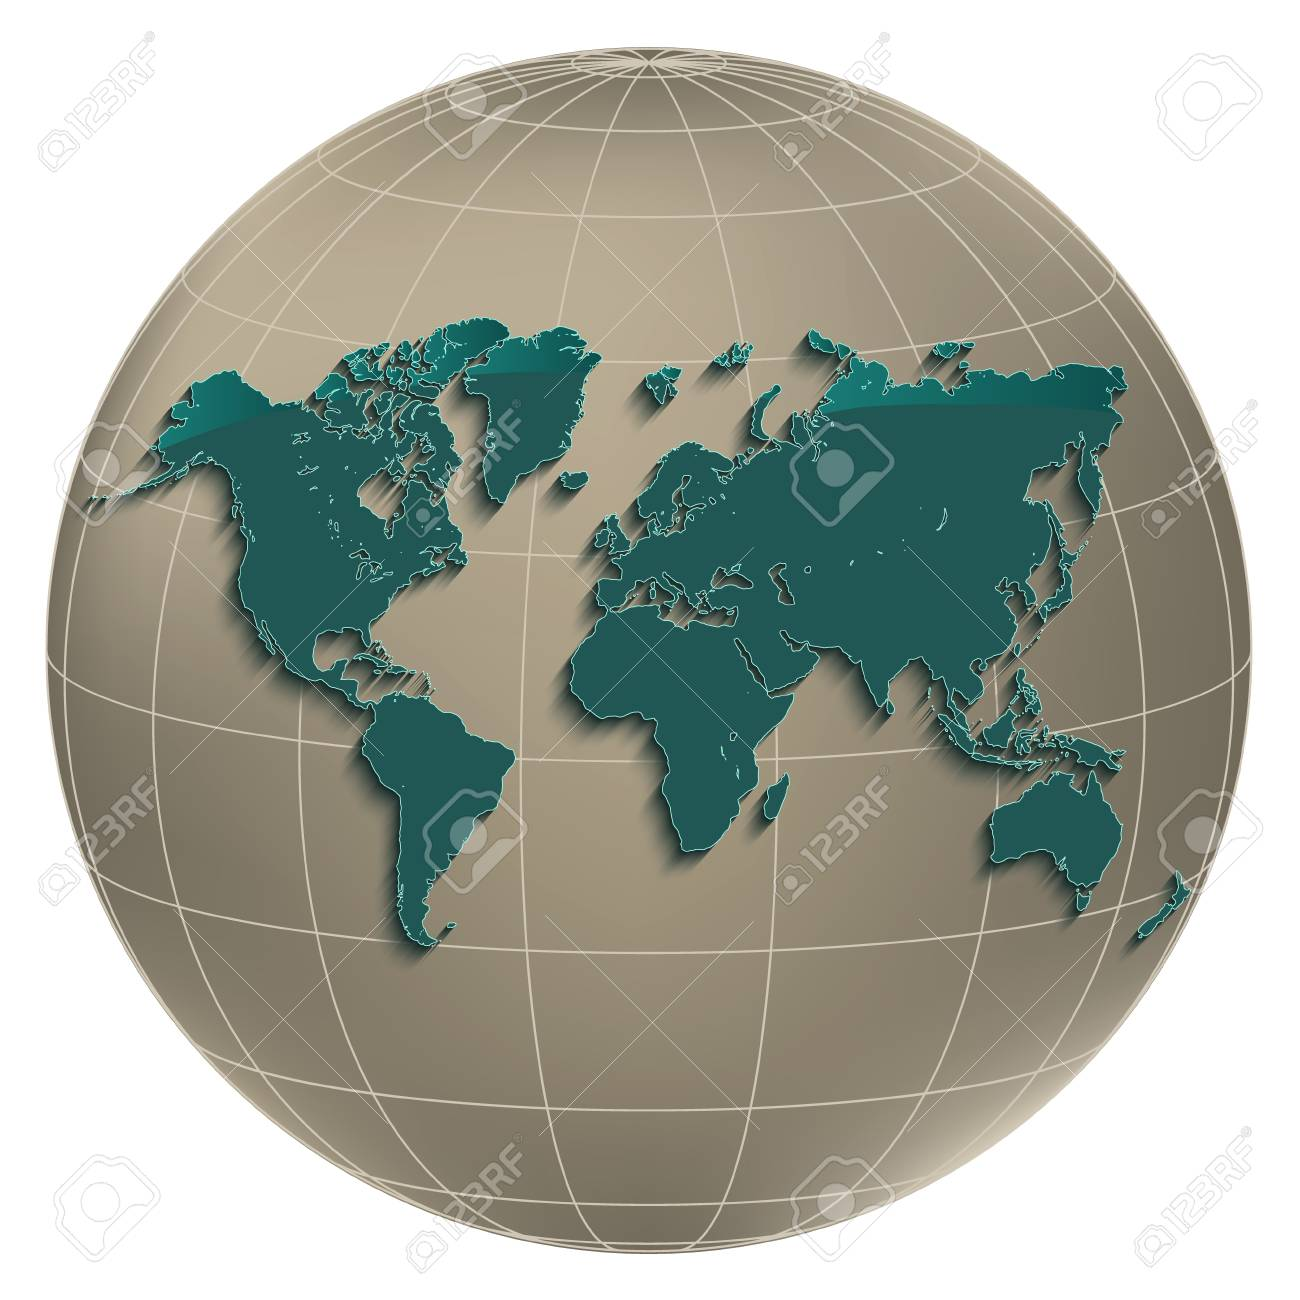 World map earth globus geographic globe coordinates white background..